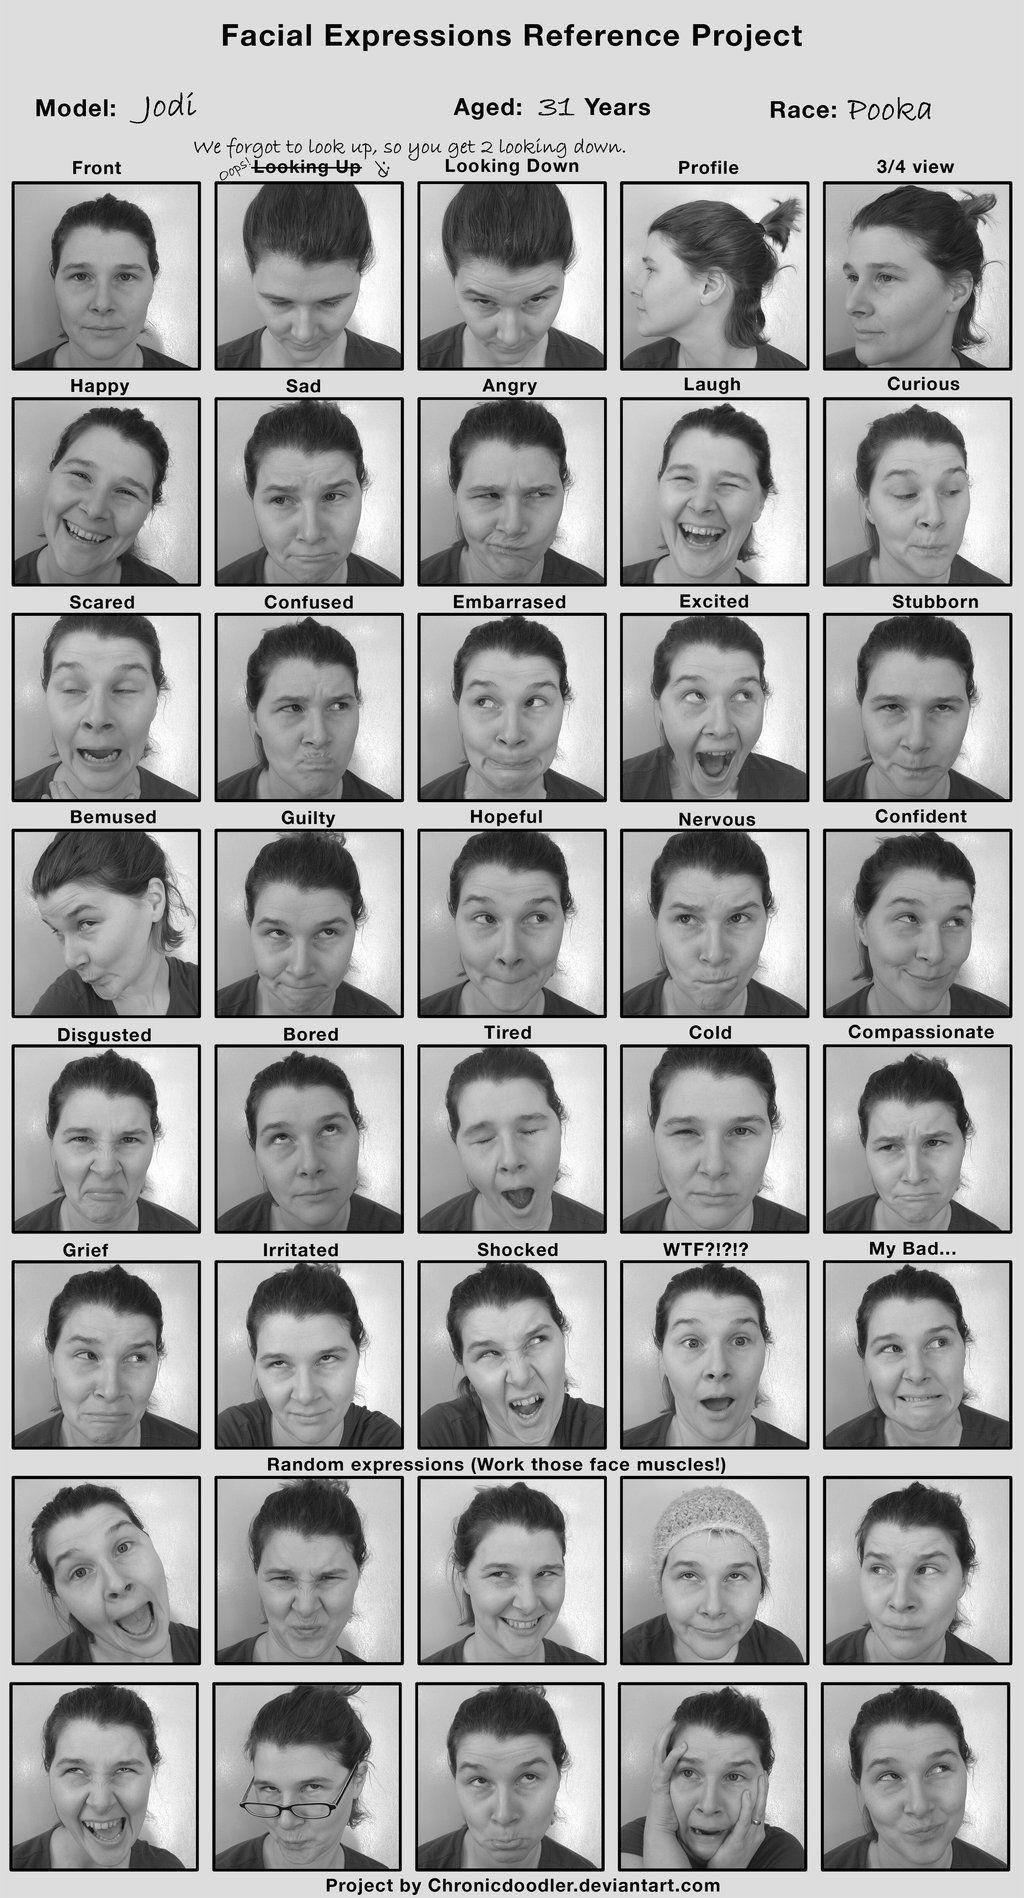 Facial Expressions Meme 2 By Fantasystock On Deviantart